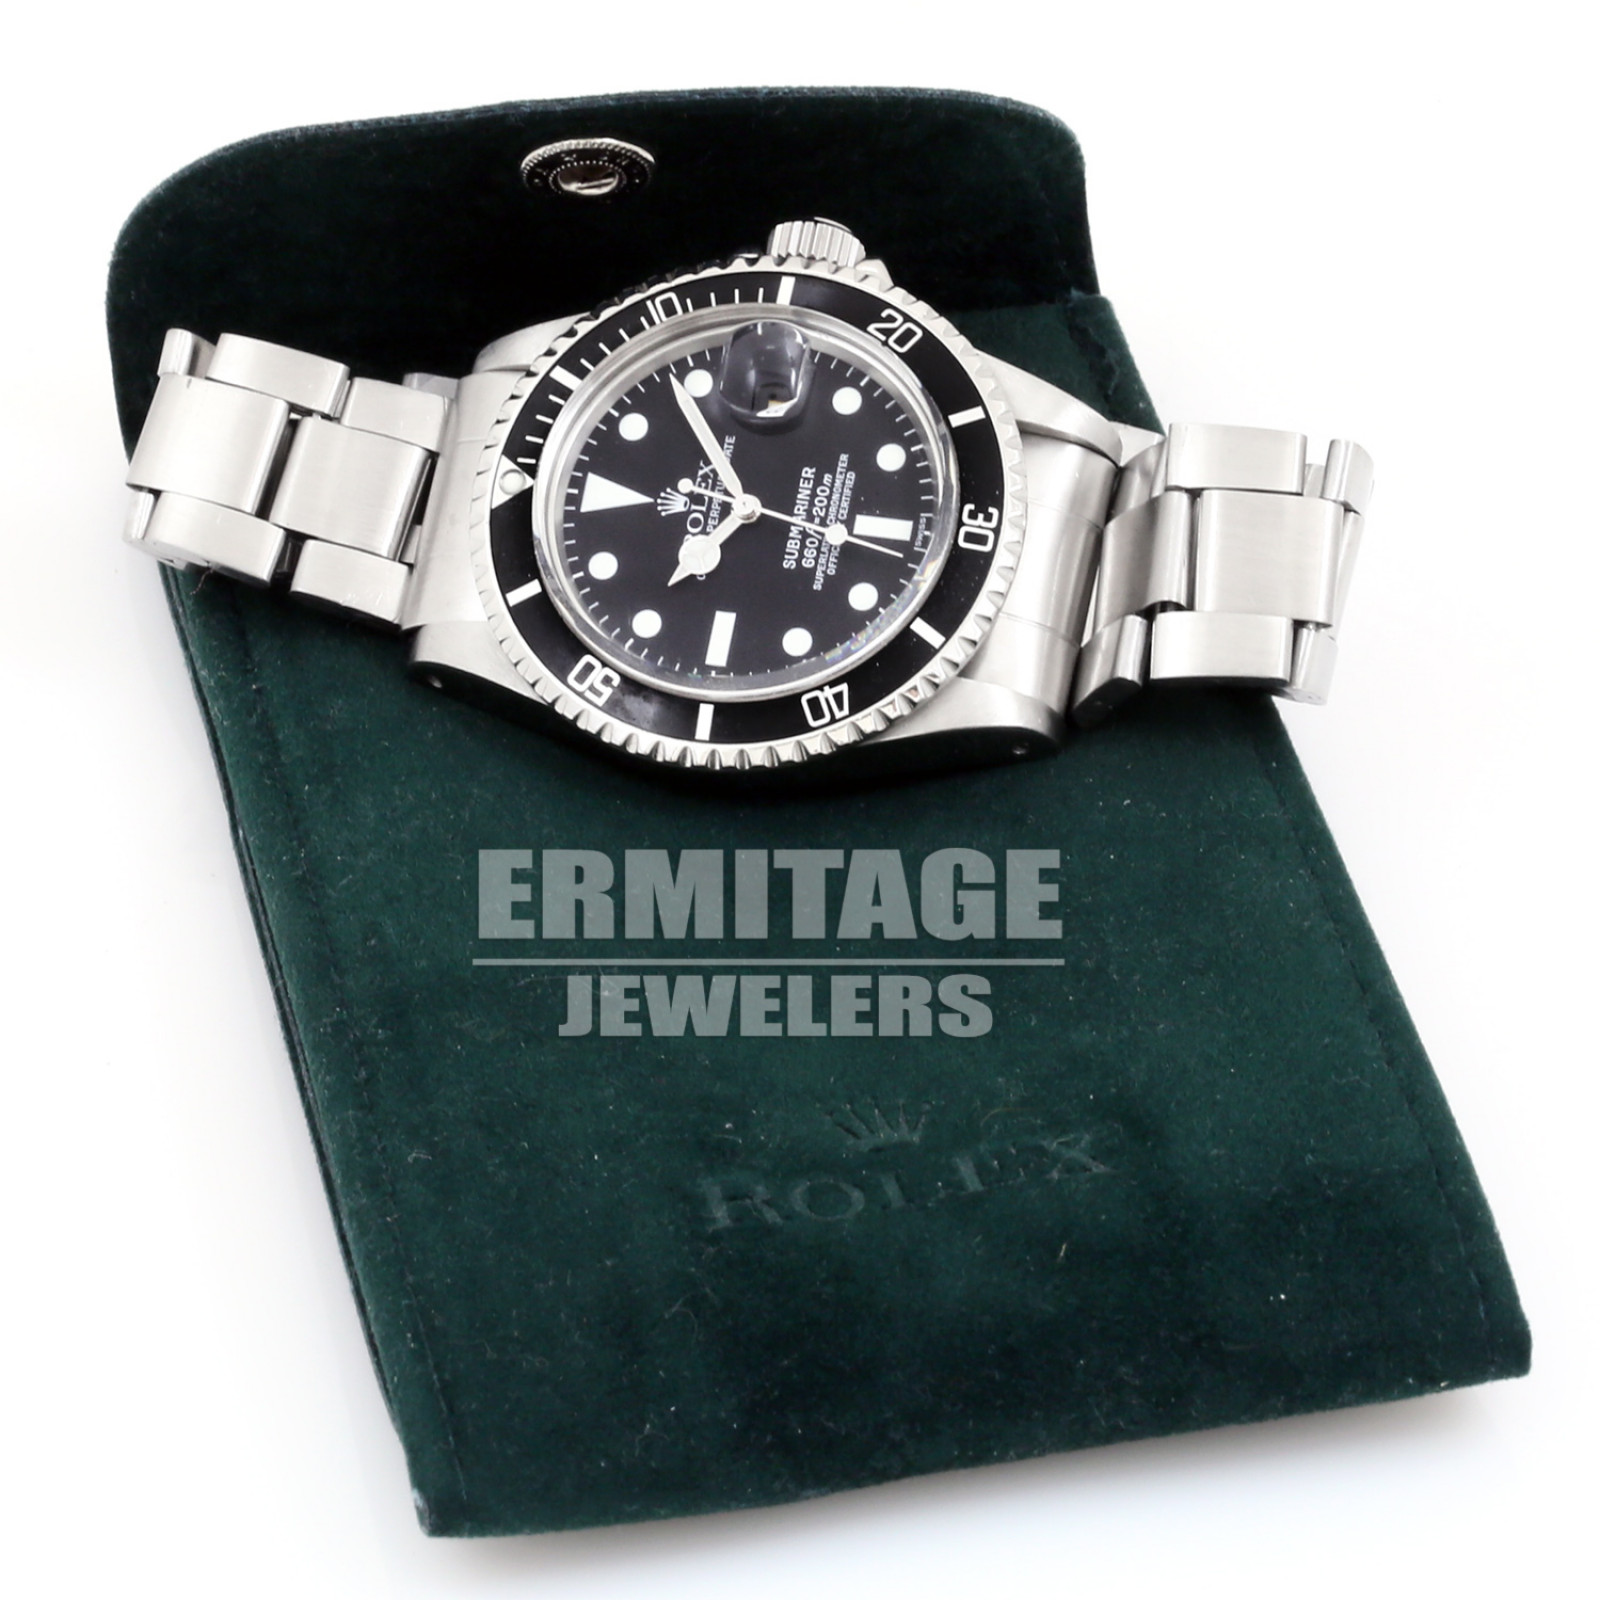 Vintage Rolex 1680 40 mm Black